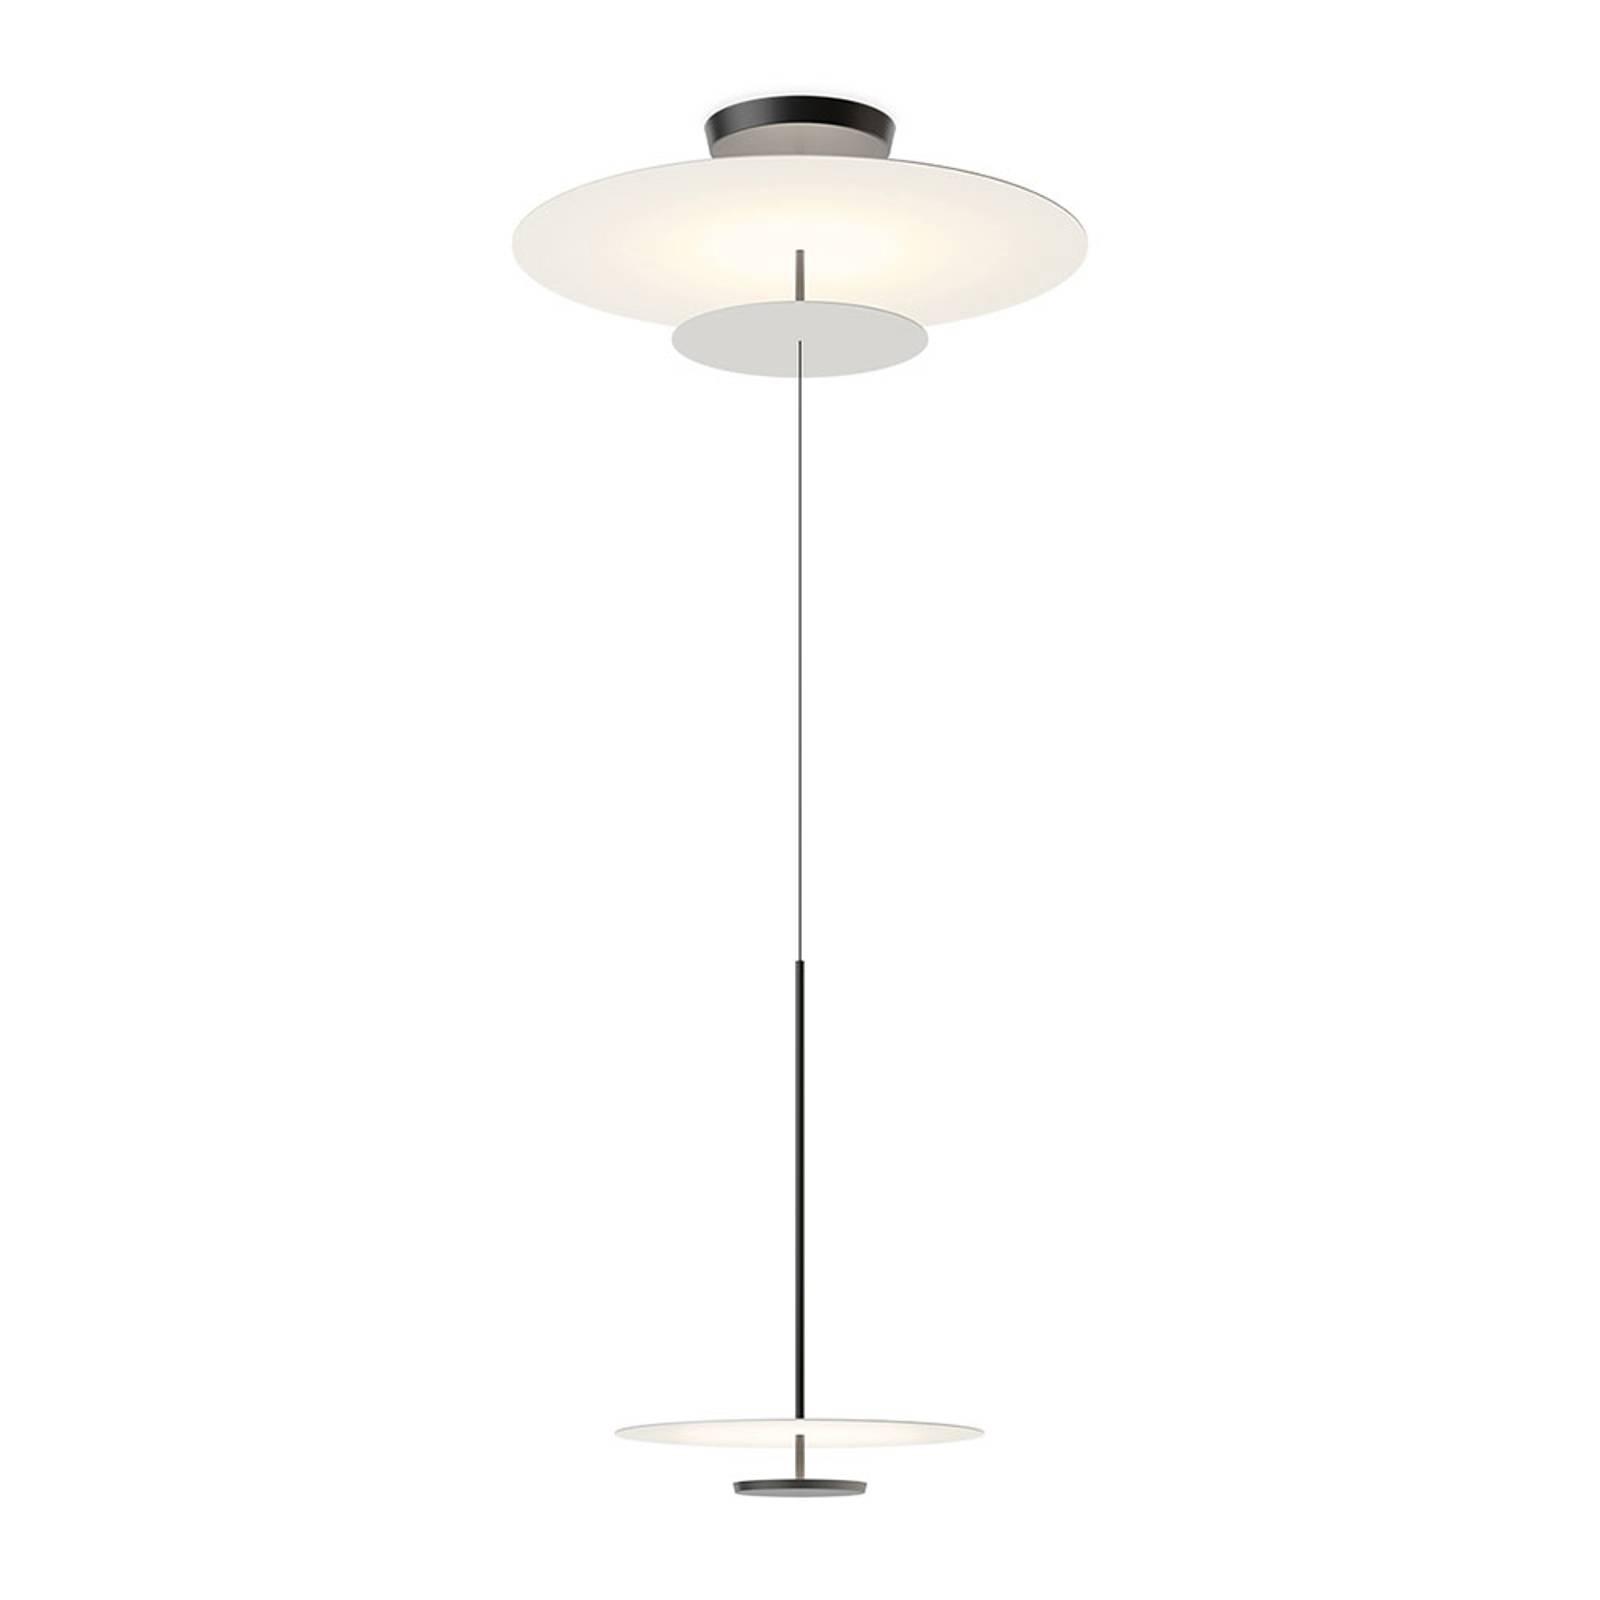 Vibia Flat -LED-riippuvalo Ø 90 cm harmaa L1